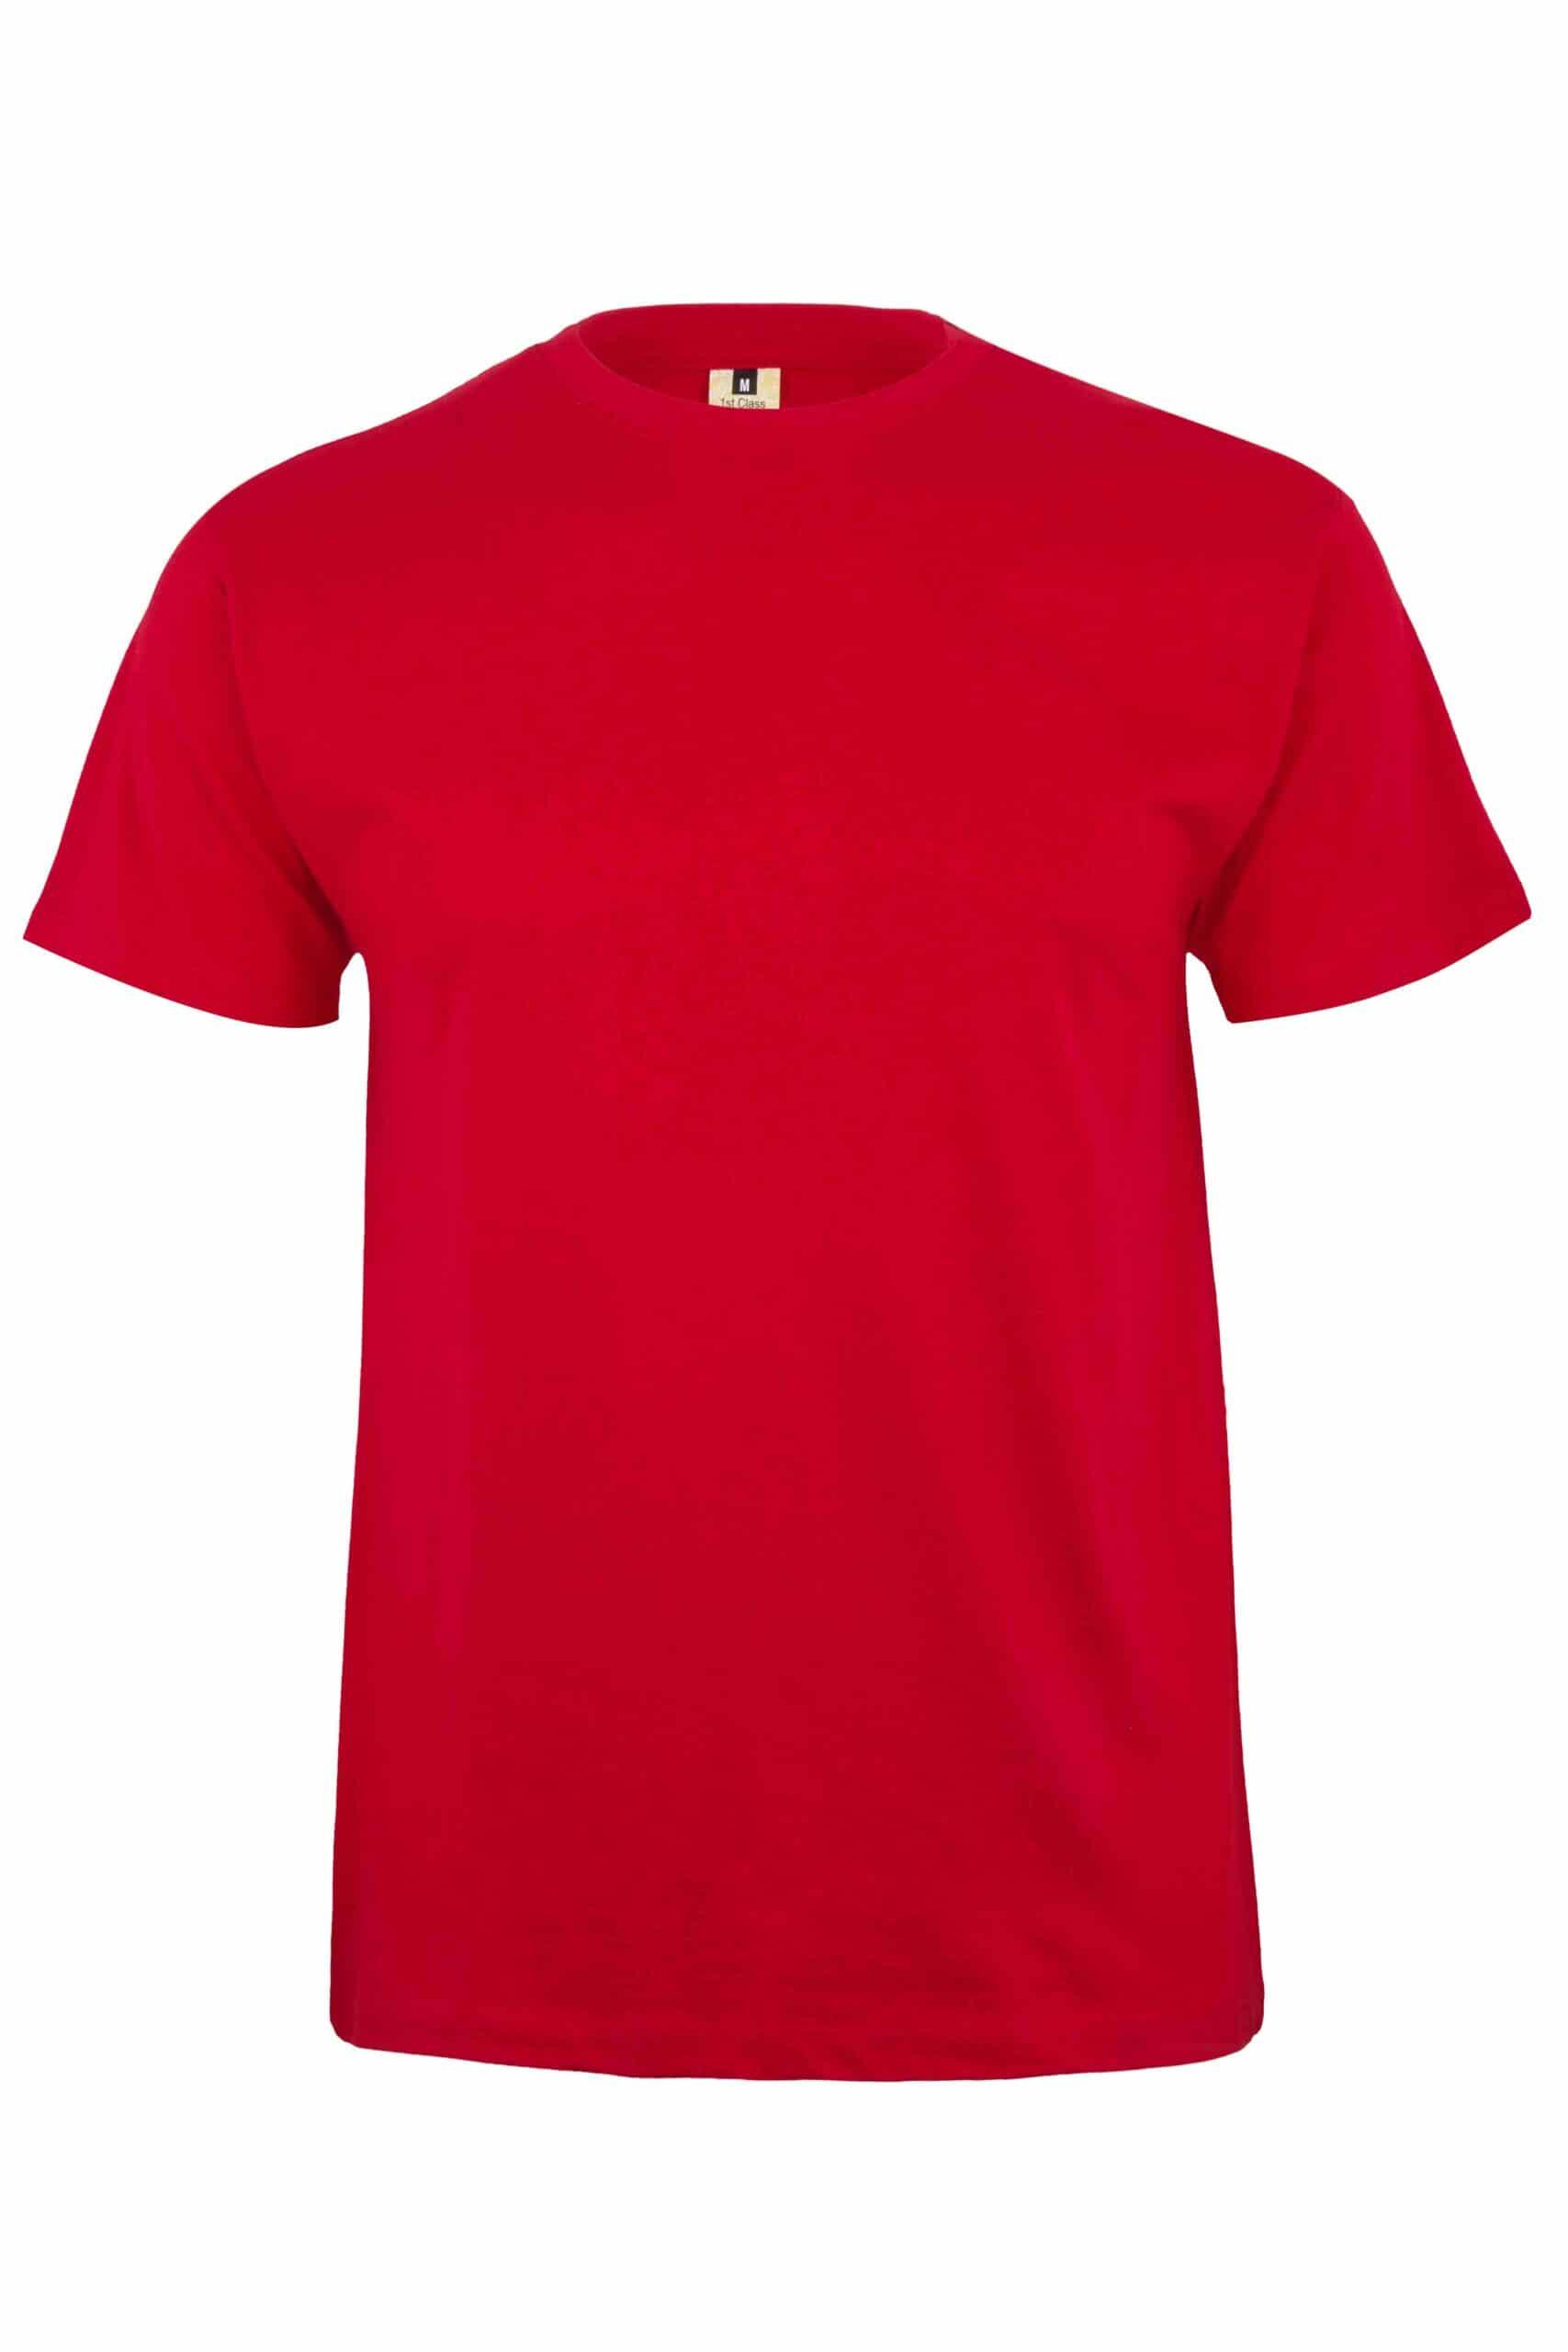 Mukua Mk023cv Camiseta Manga Corta Color 190gr Red